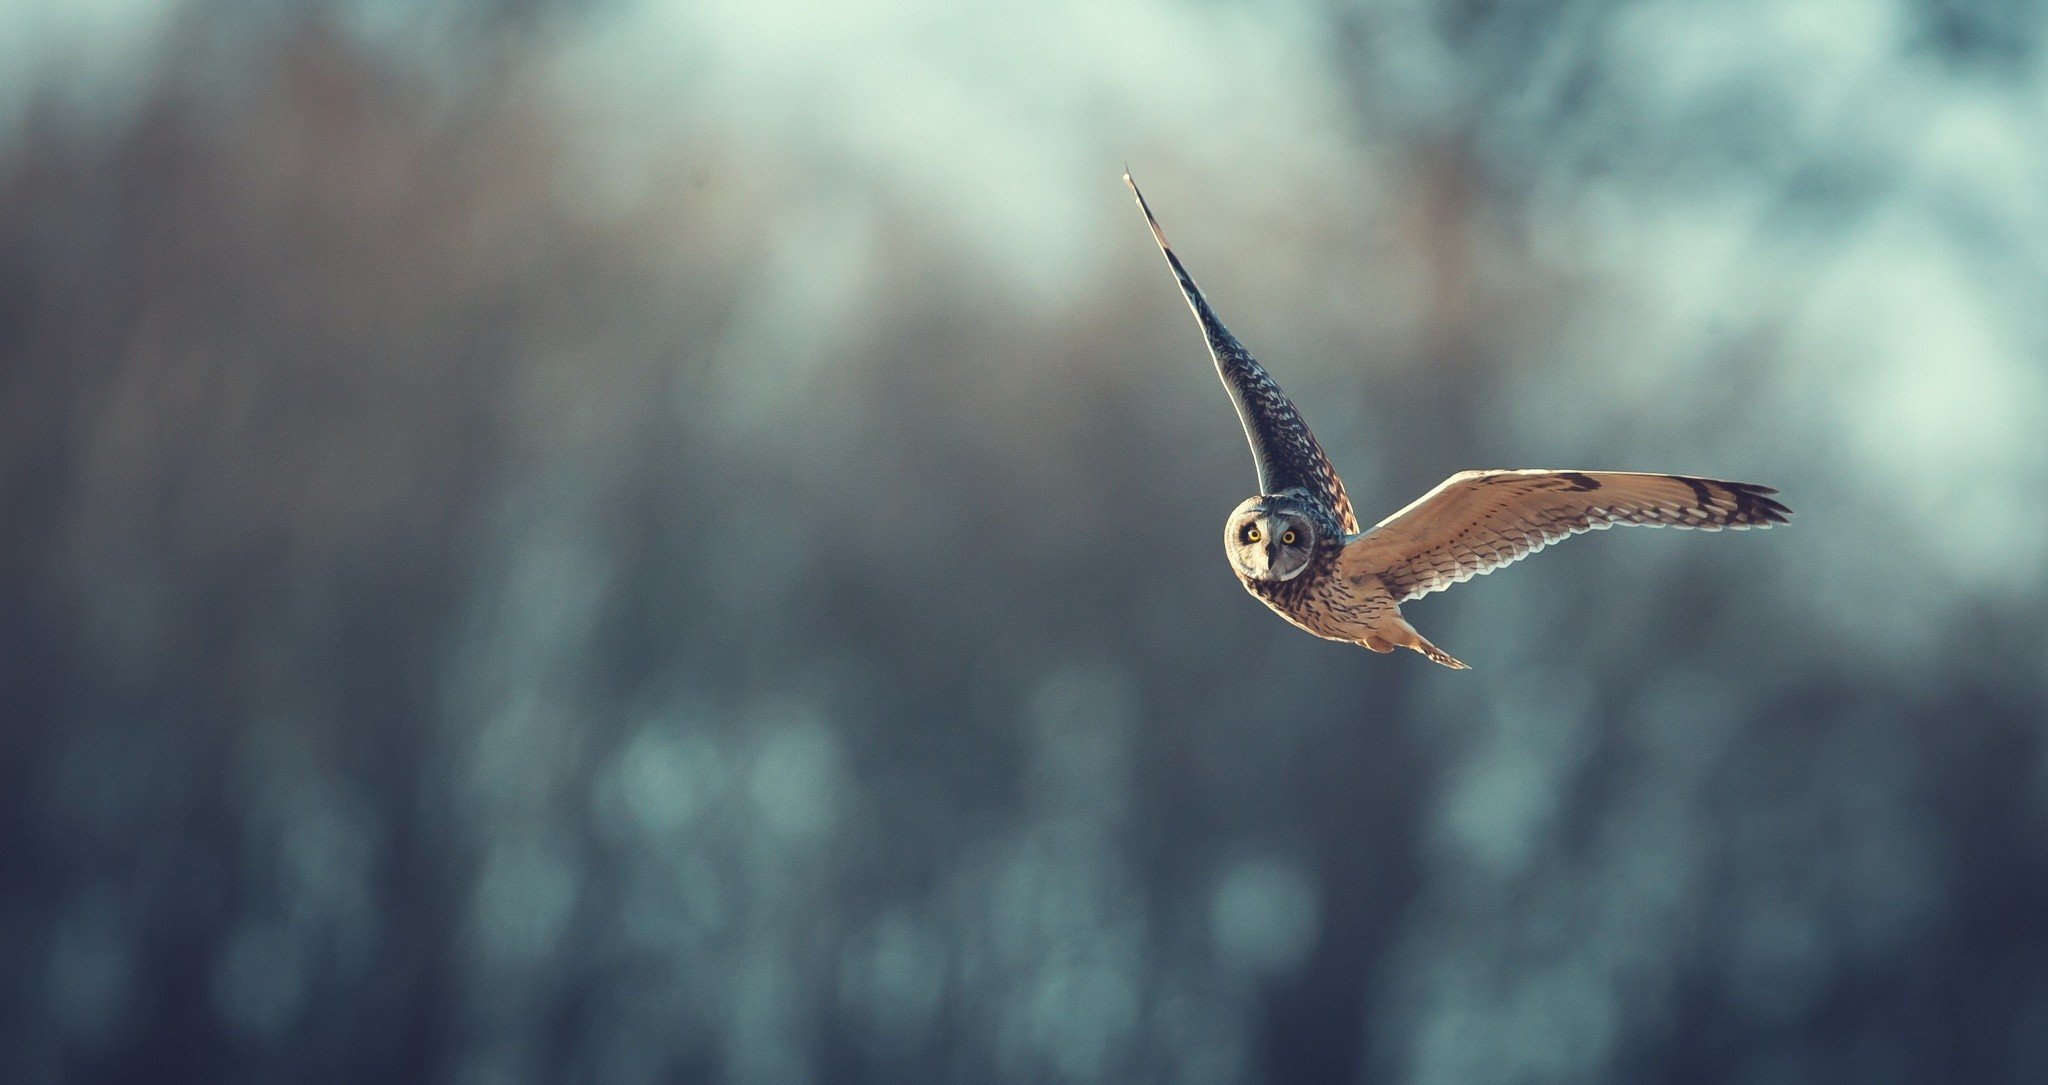 birds, Animals, Bird of prey, Owl Wallpaper